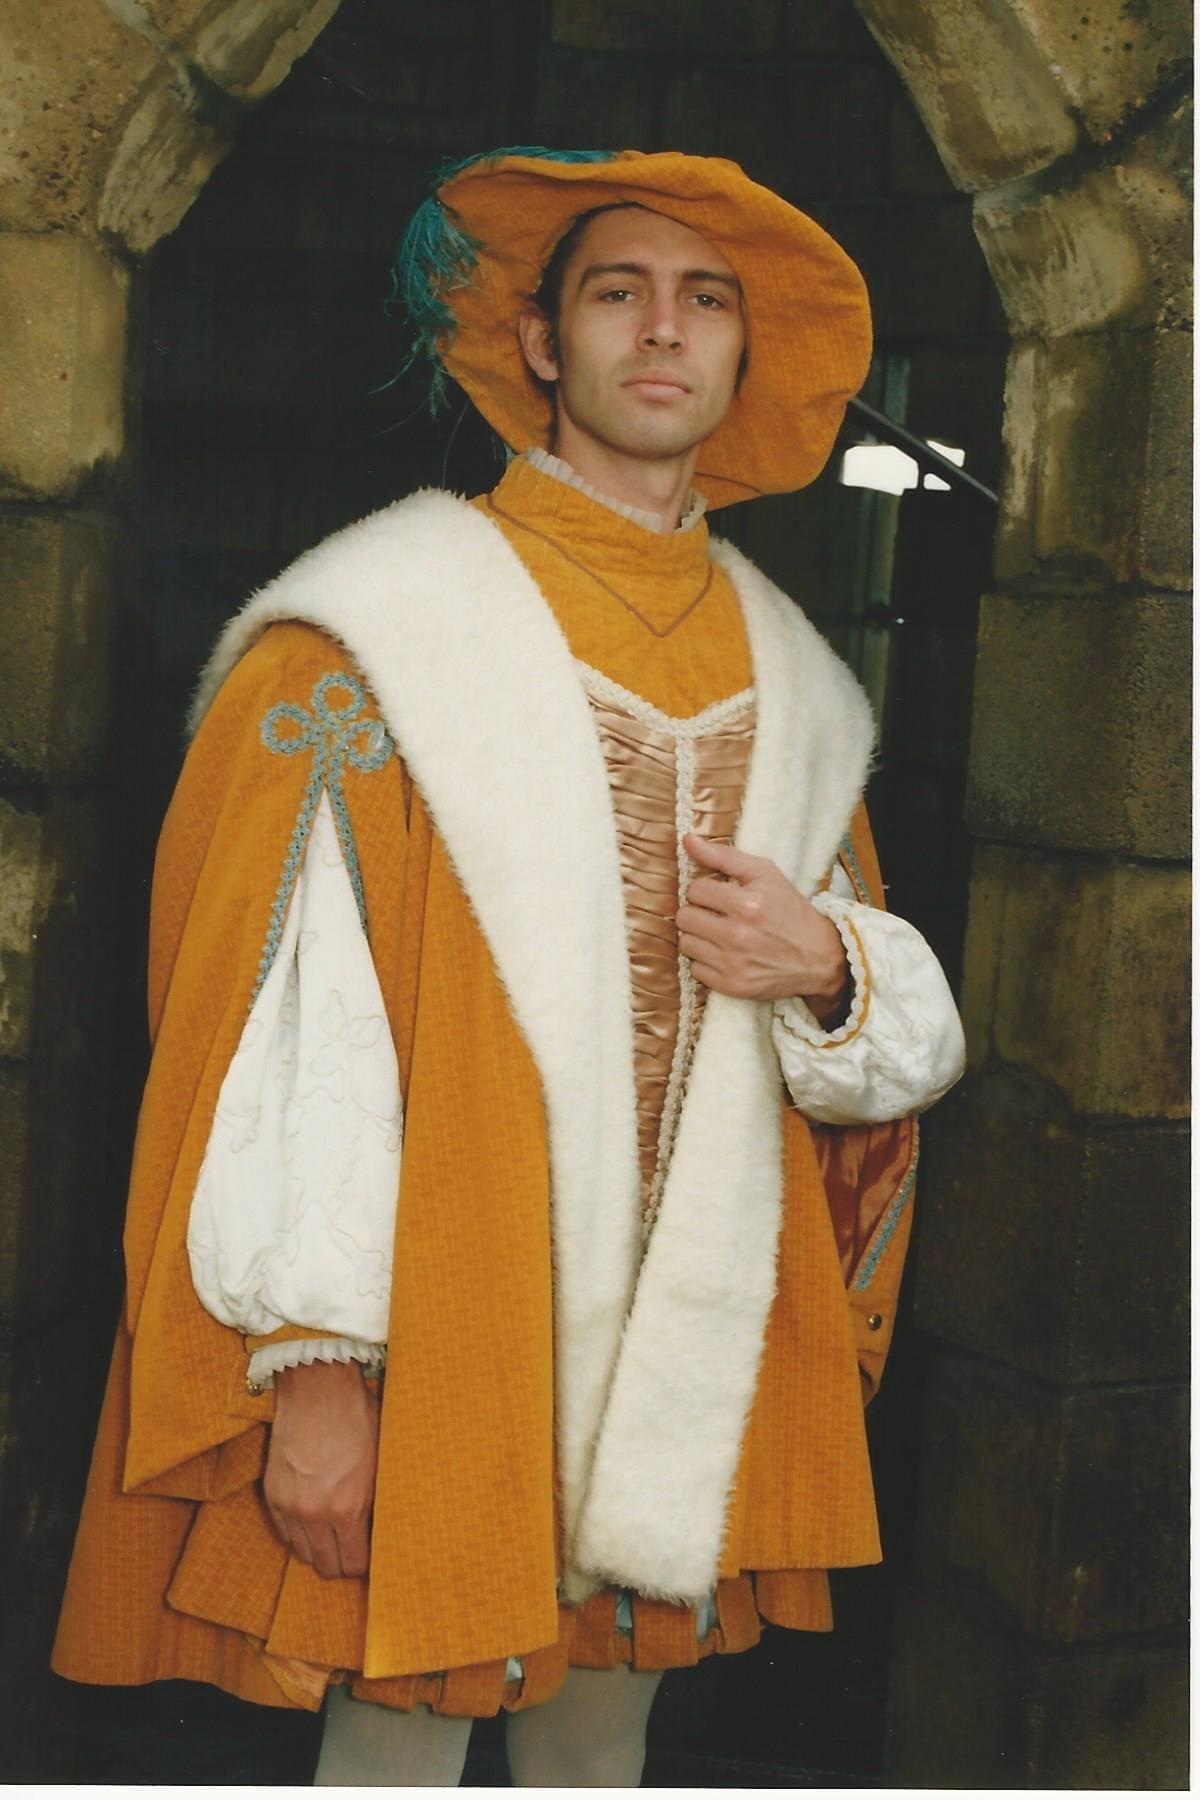 Yeomen of the Guard 19980006.jpg